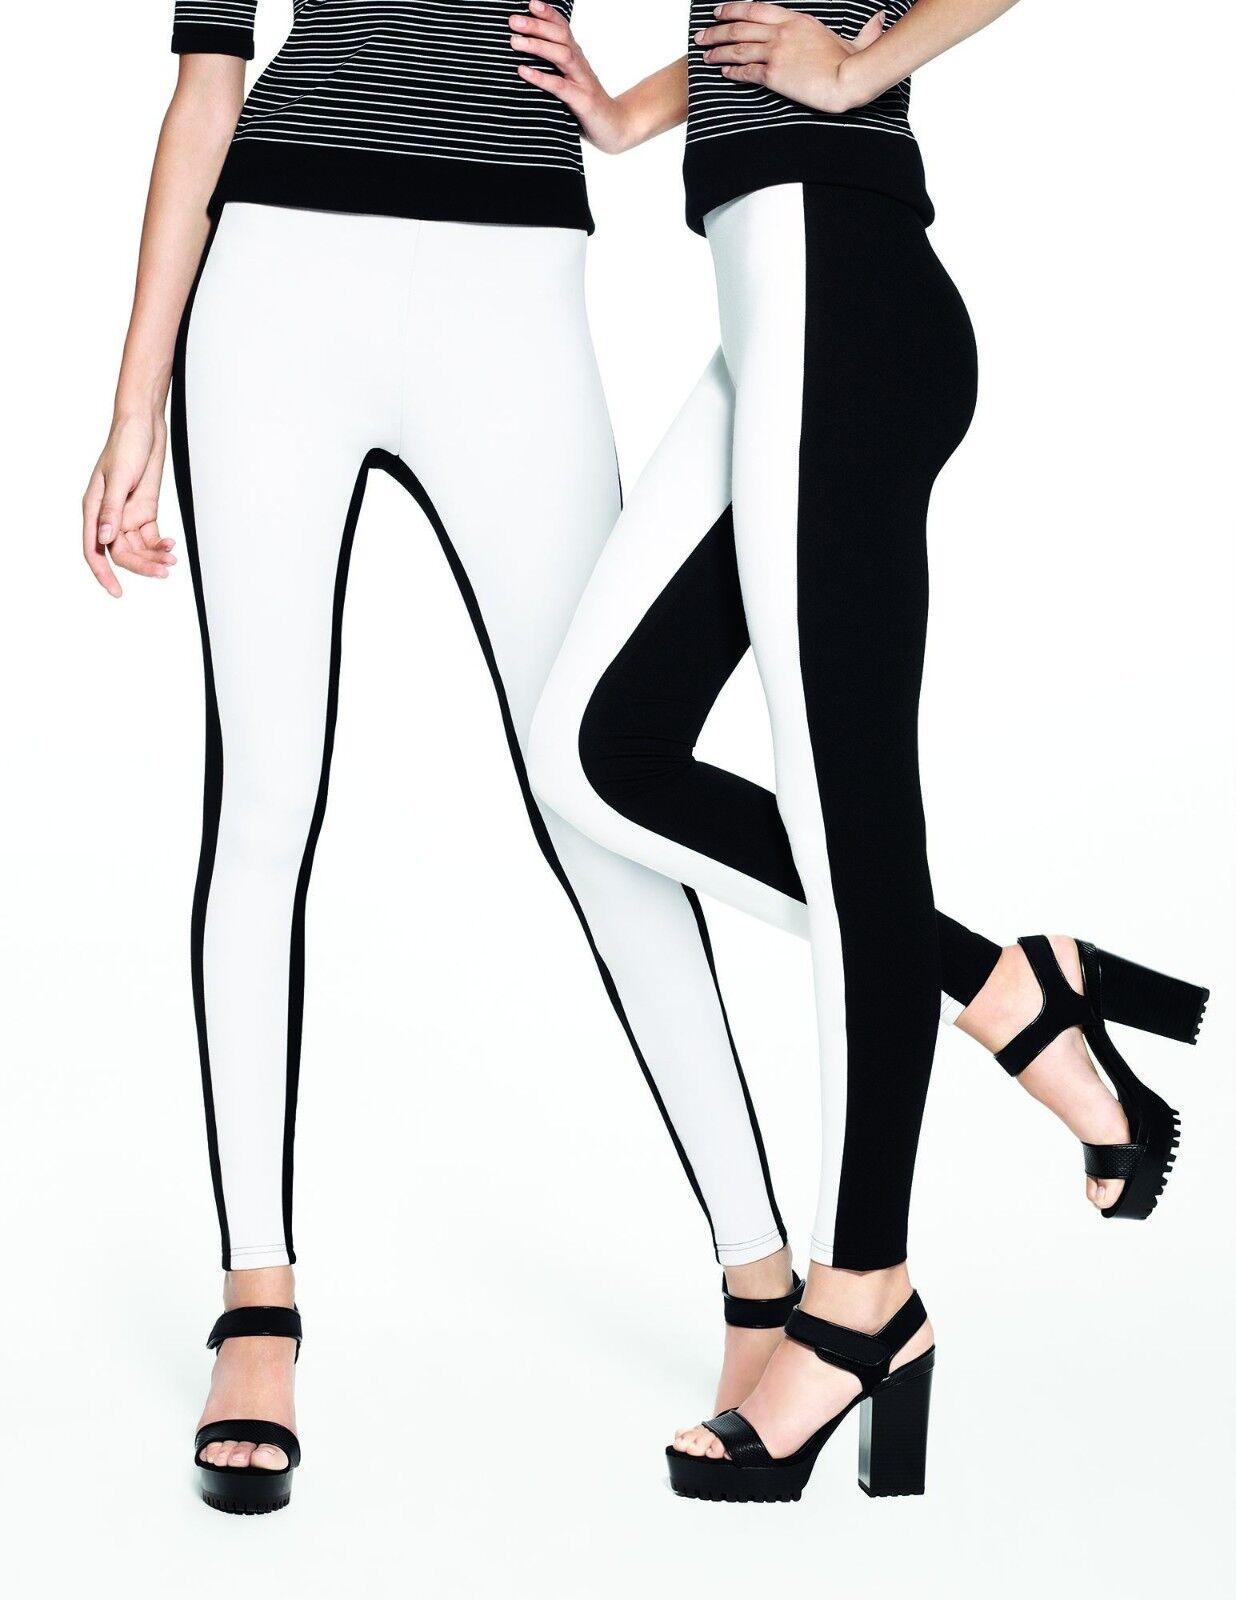 S Hue Leggings Colorblock Illusion Stretch Ponte Leggings XS L,XL M